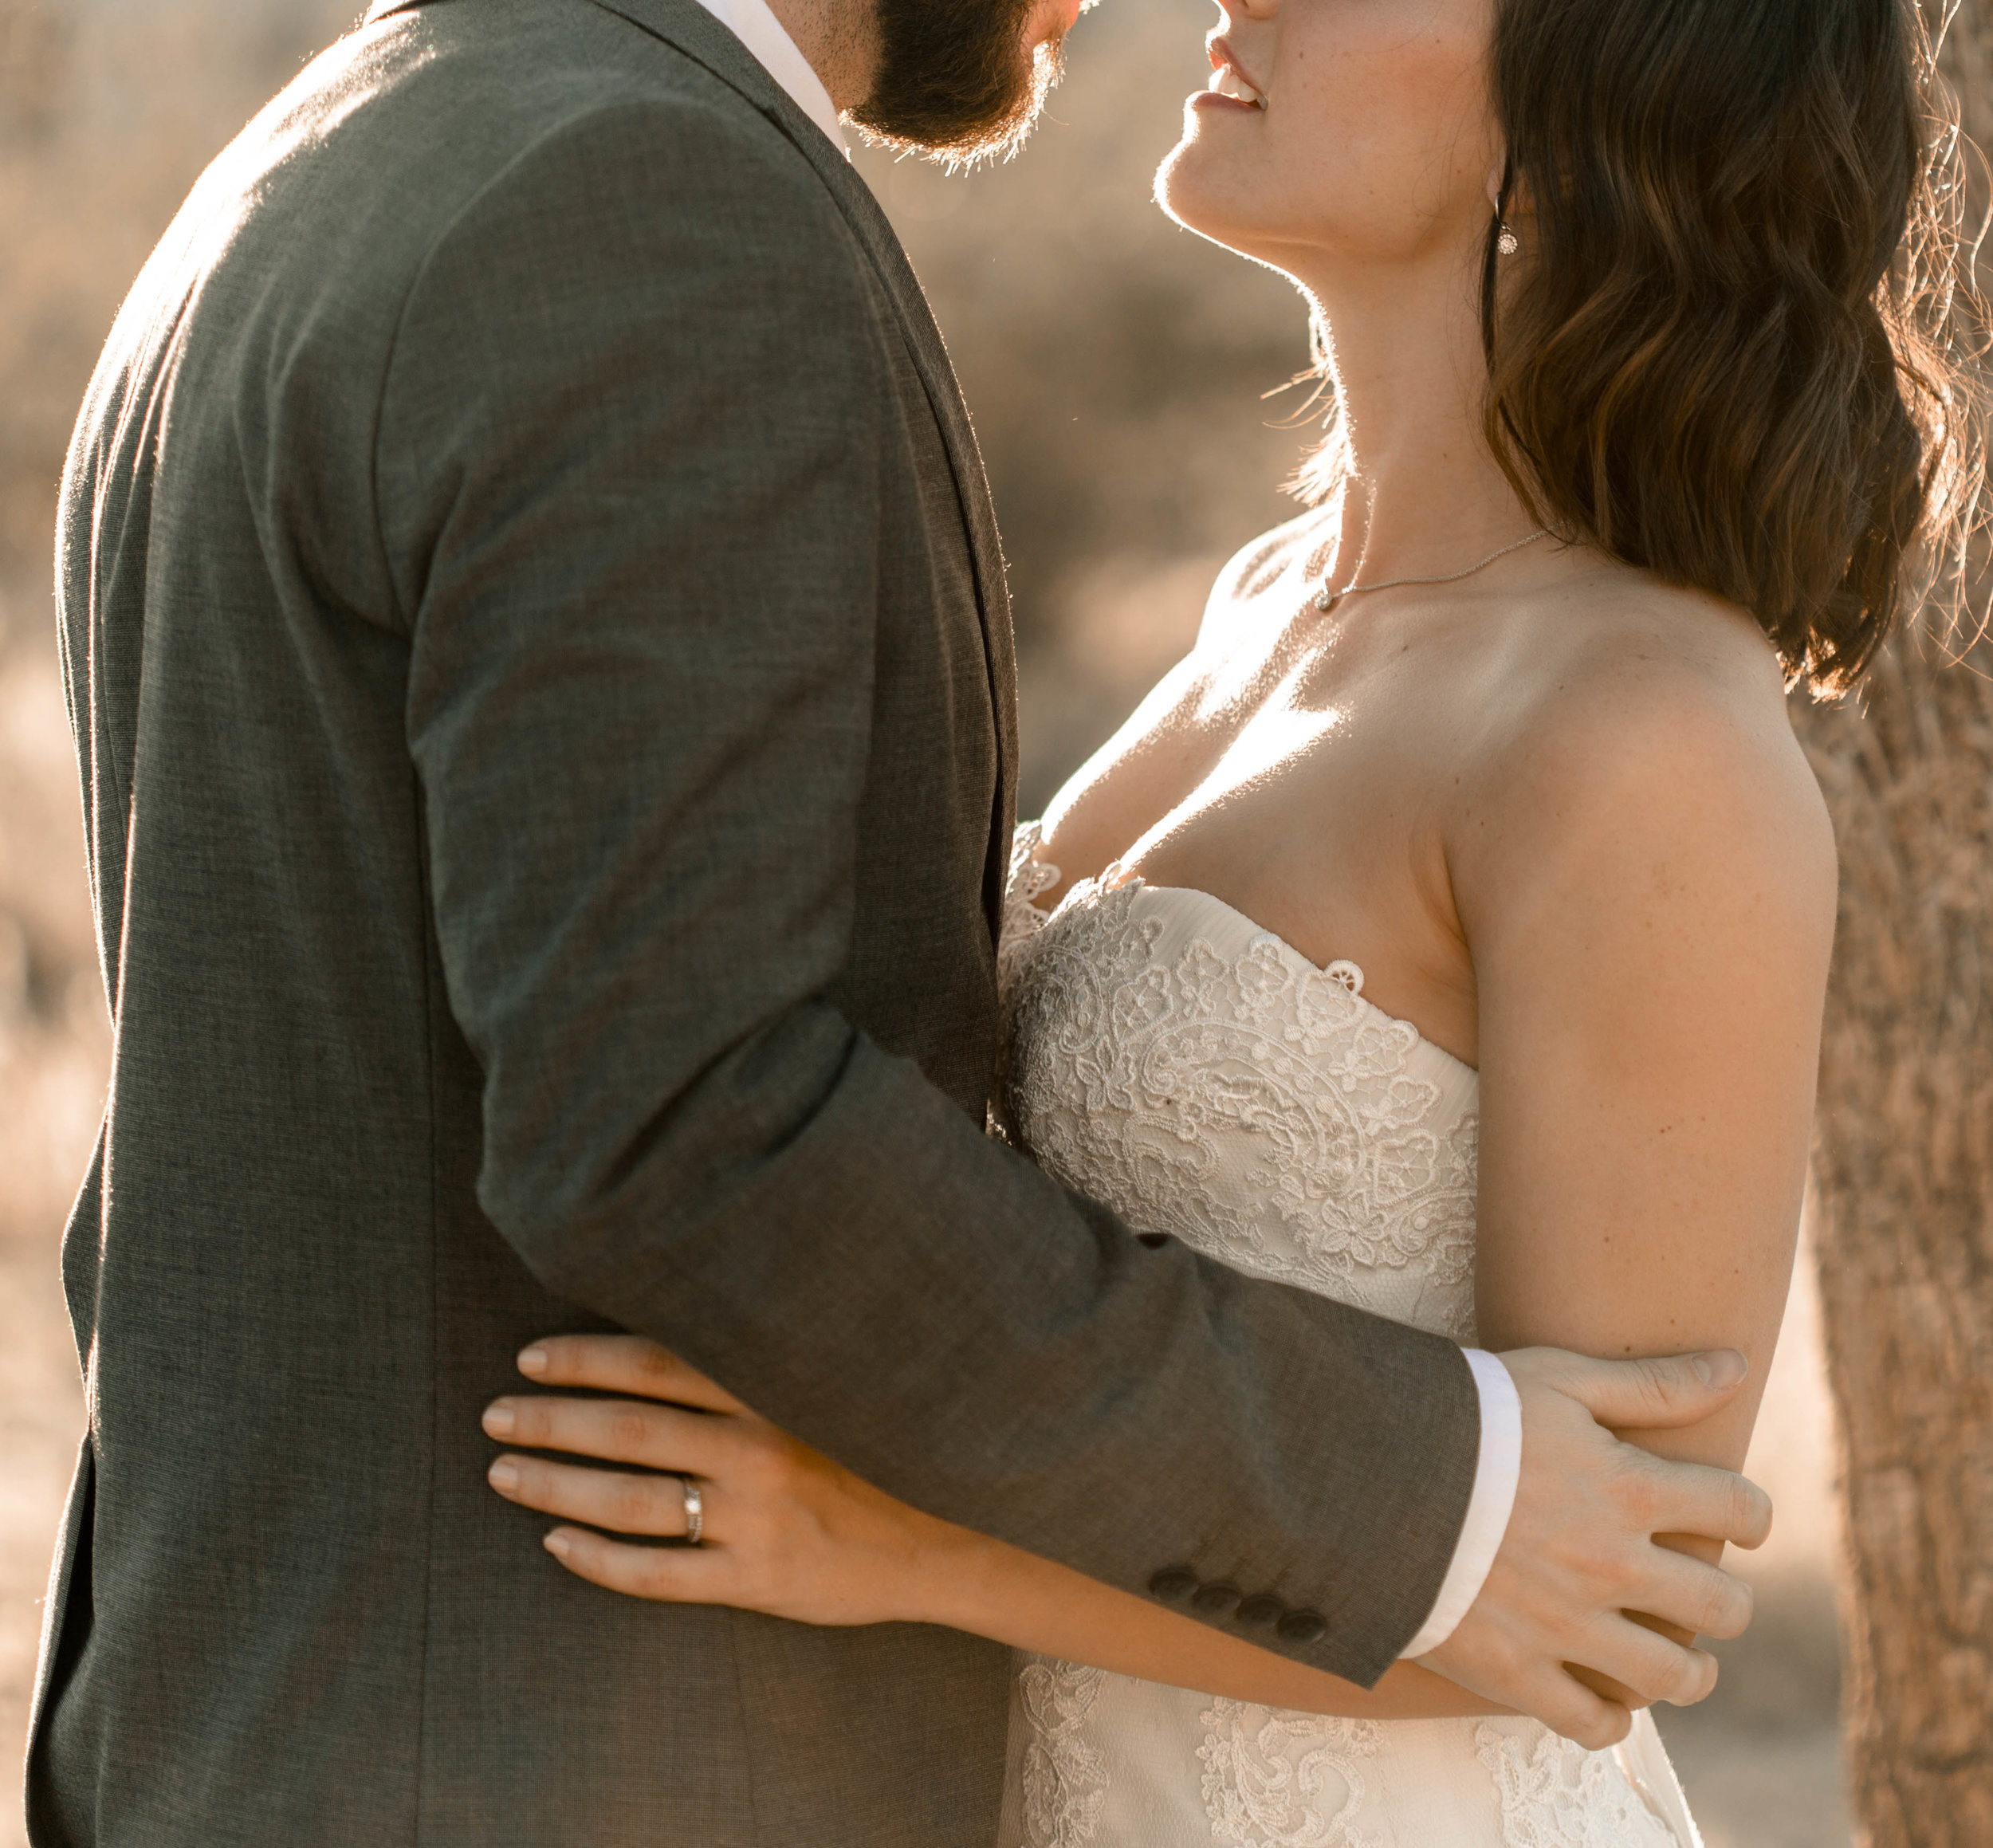 nicole-daacke-photography-joshua-tree-adventurous-elopement-wedding-national-park-wedding-photographer-adventure-wedding-adventurous-elopement-jtree-joshua-tree-national-park-wedding-photographer-intimate-weddings-golden-desert-love-3.jpg